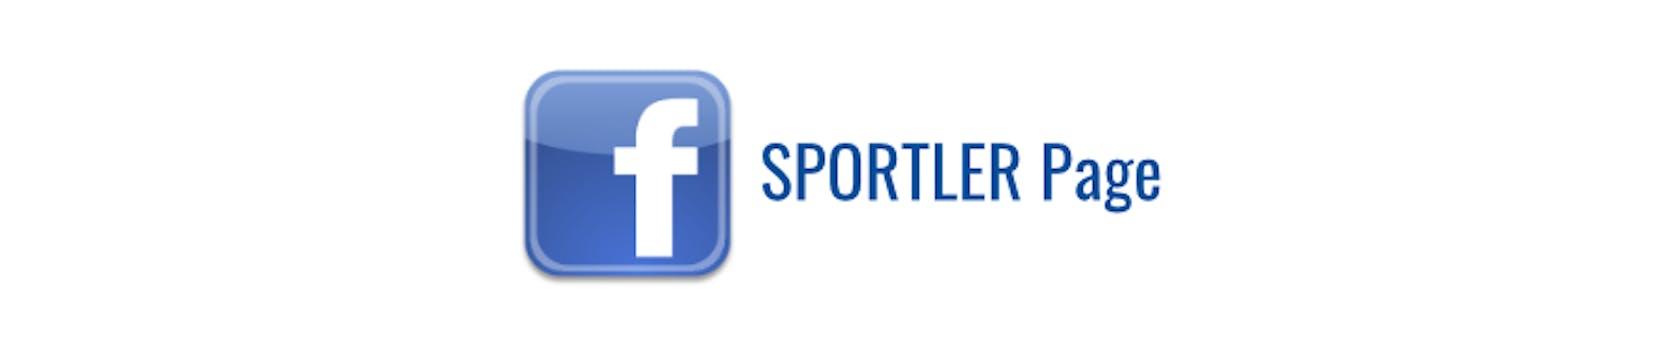 SPORTLER Facebook